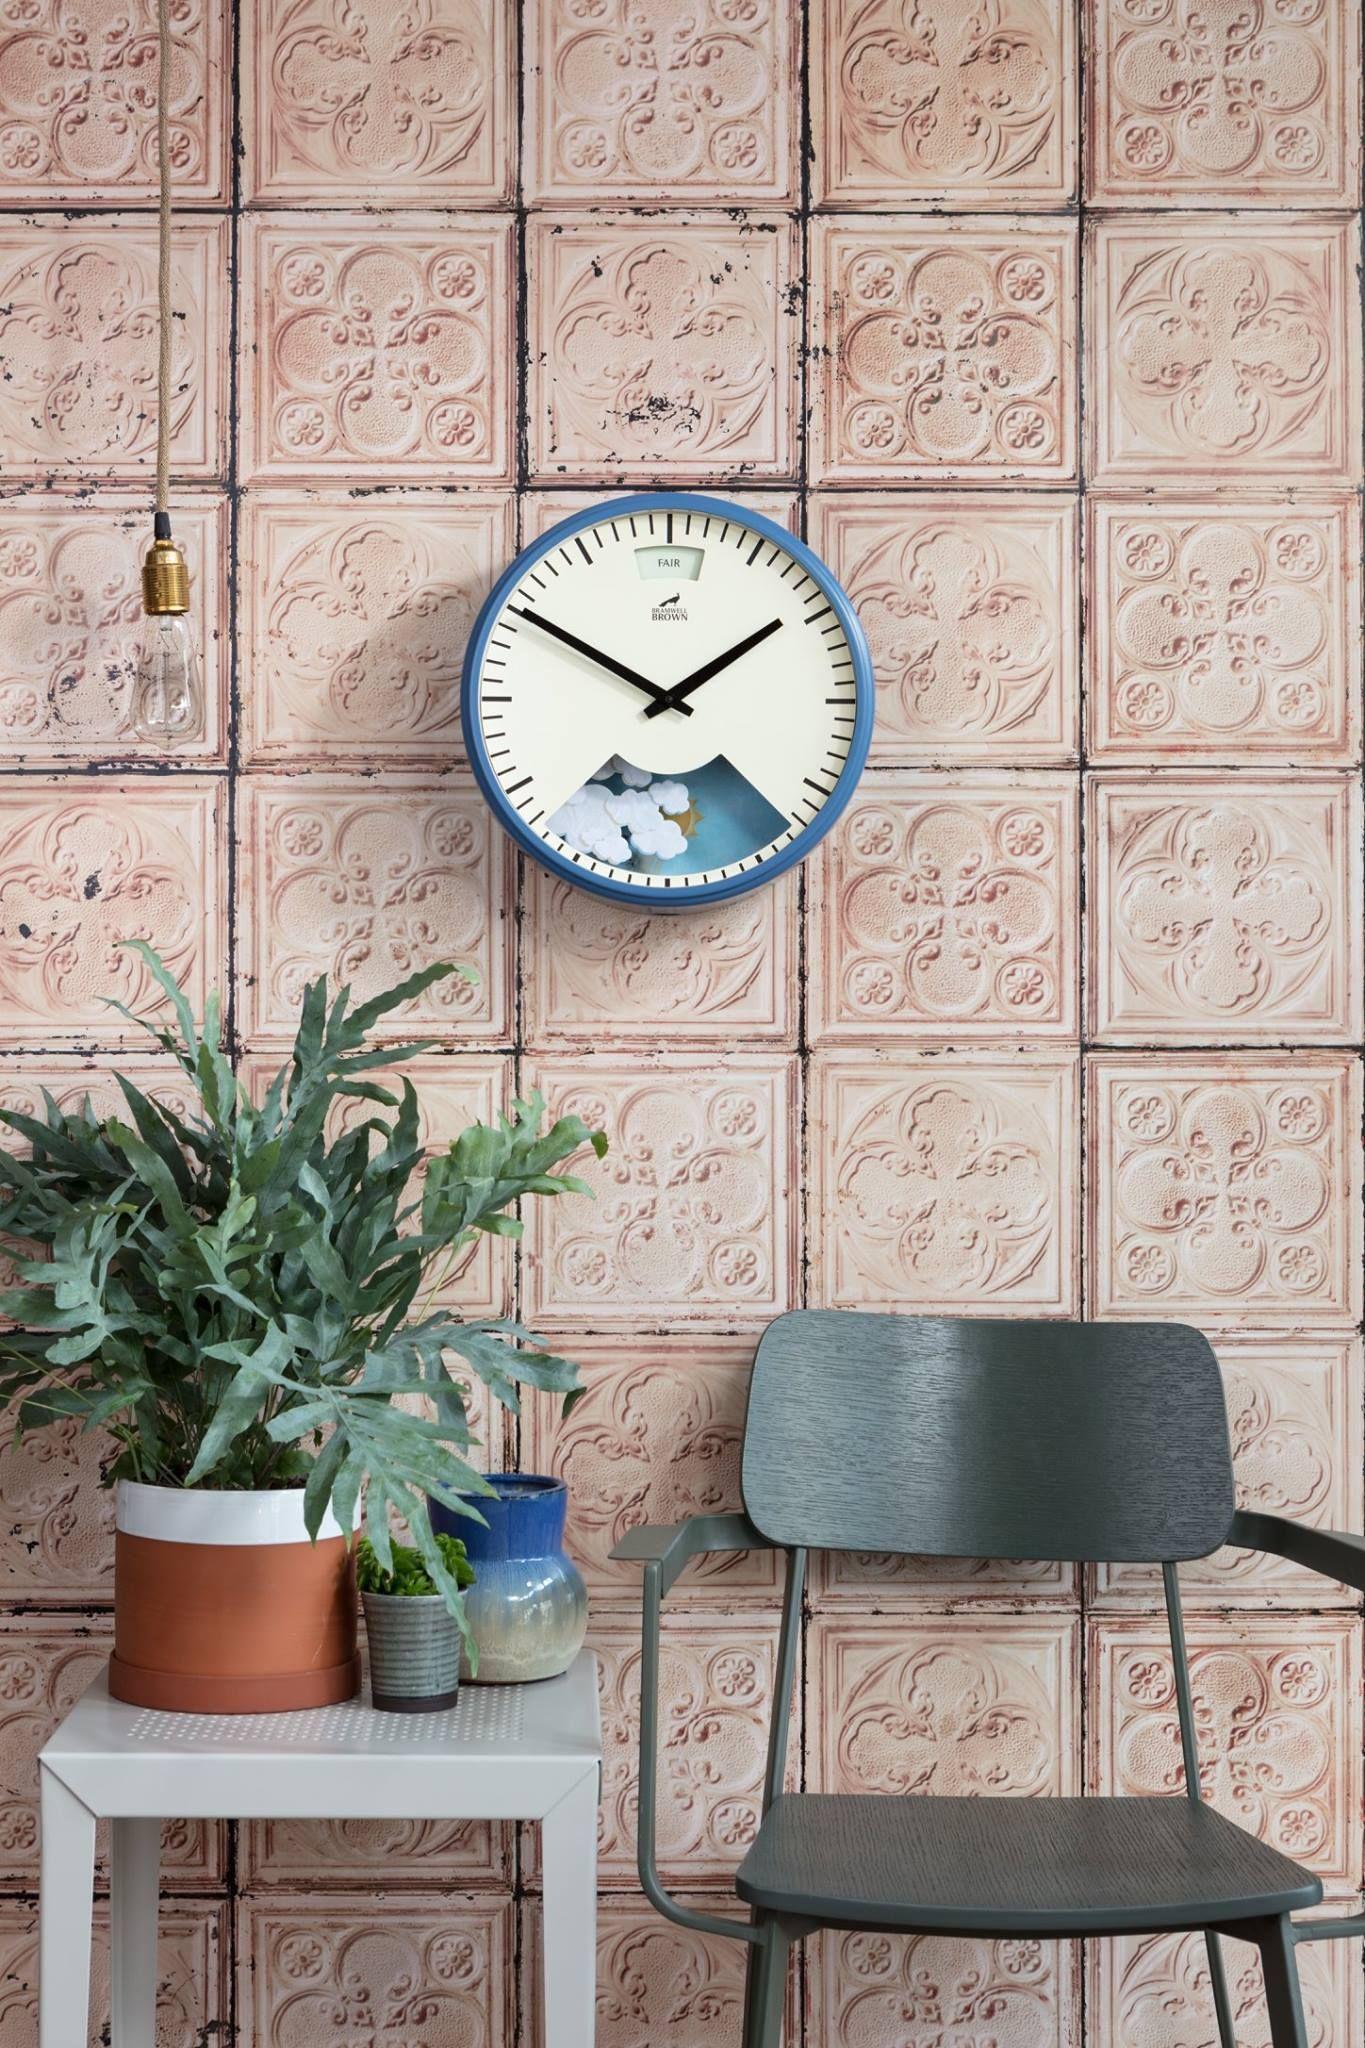 Bramwell Brown Mechanimated Weather Wall Clocks can be